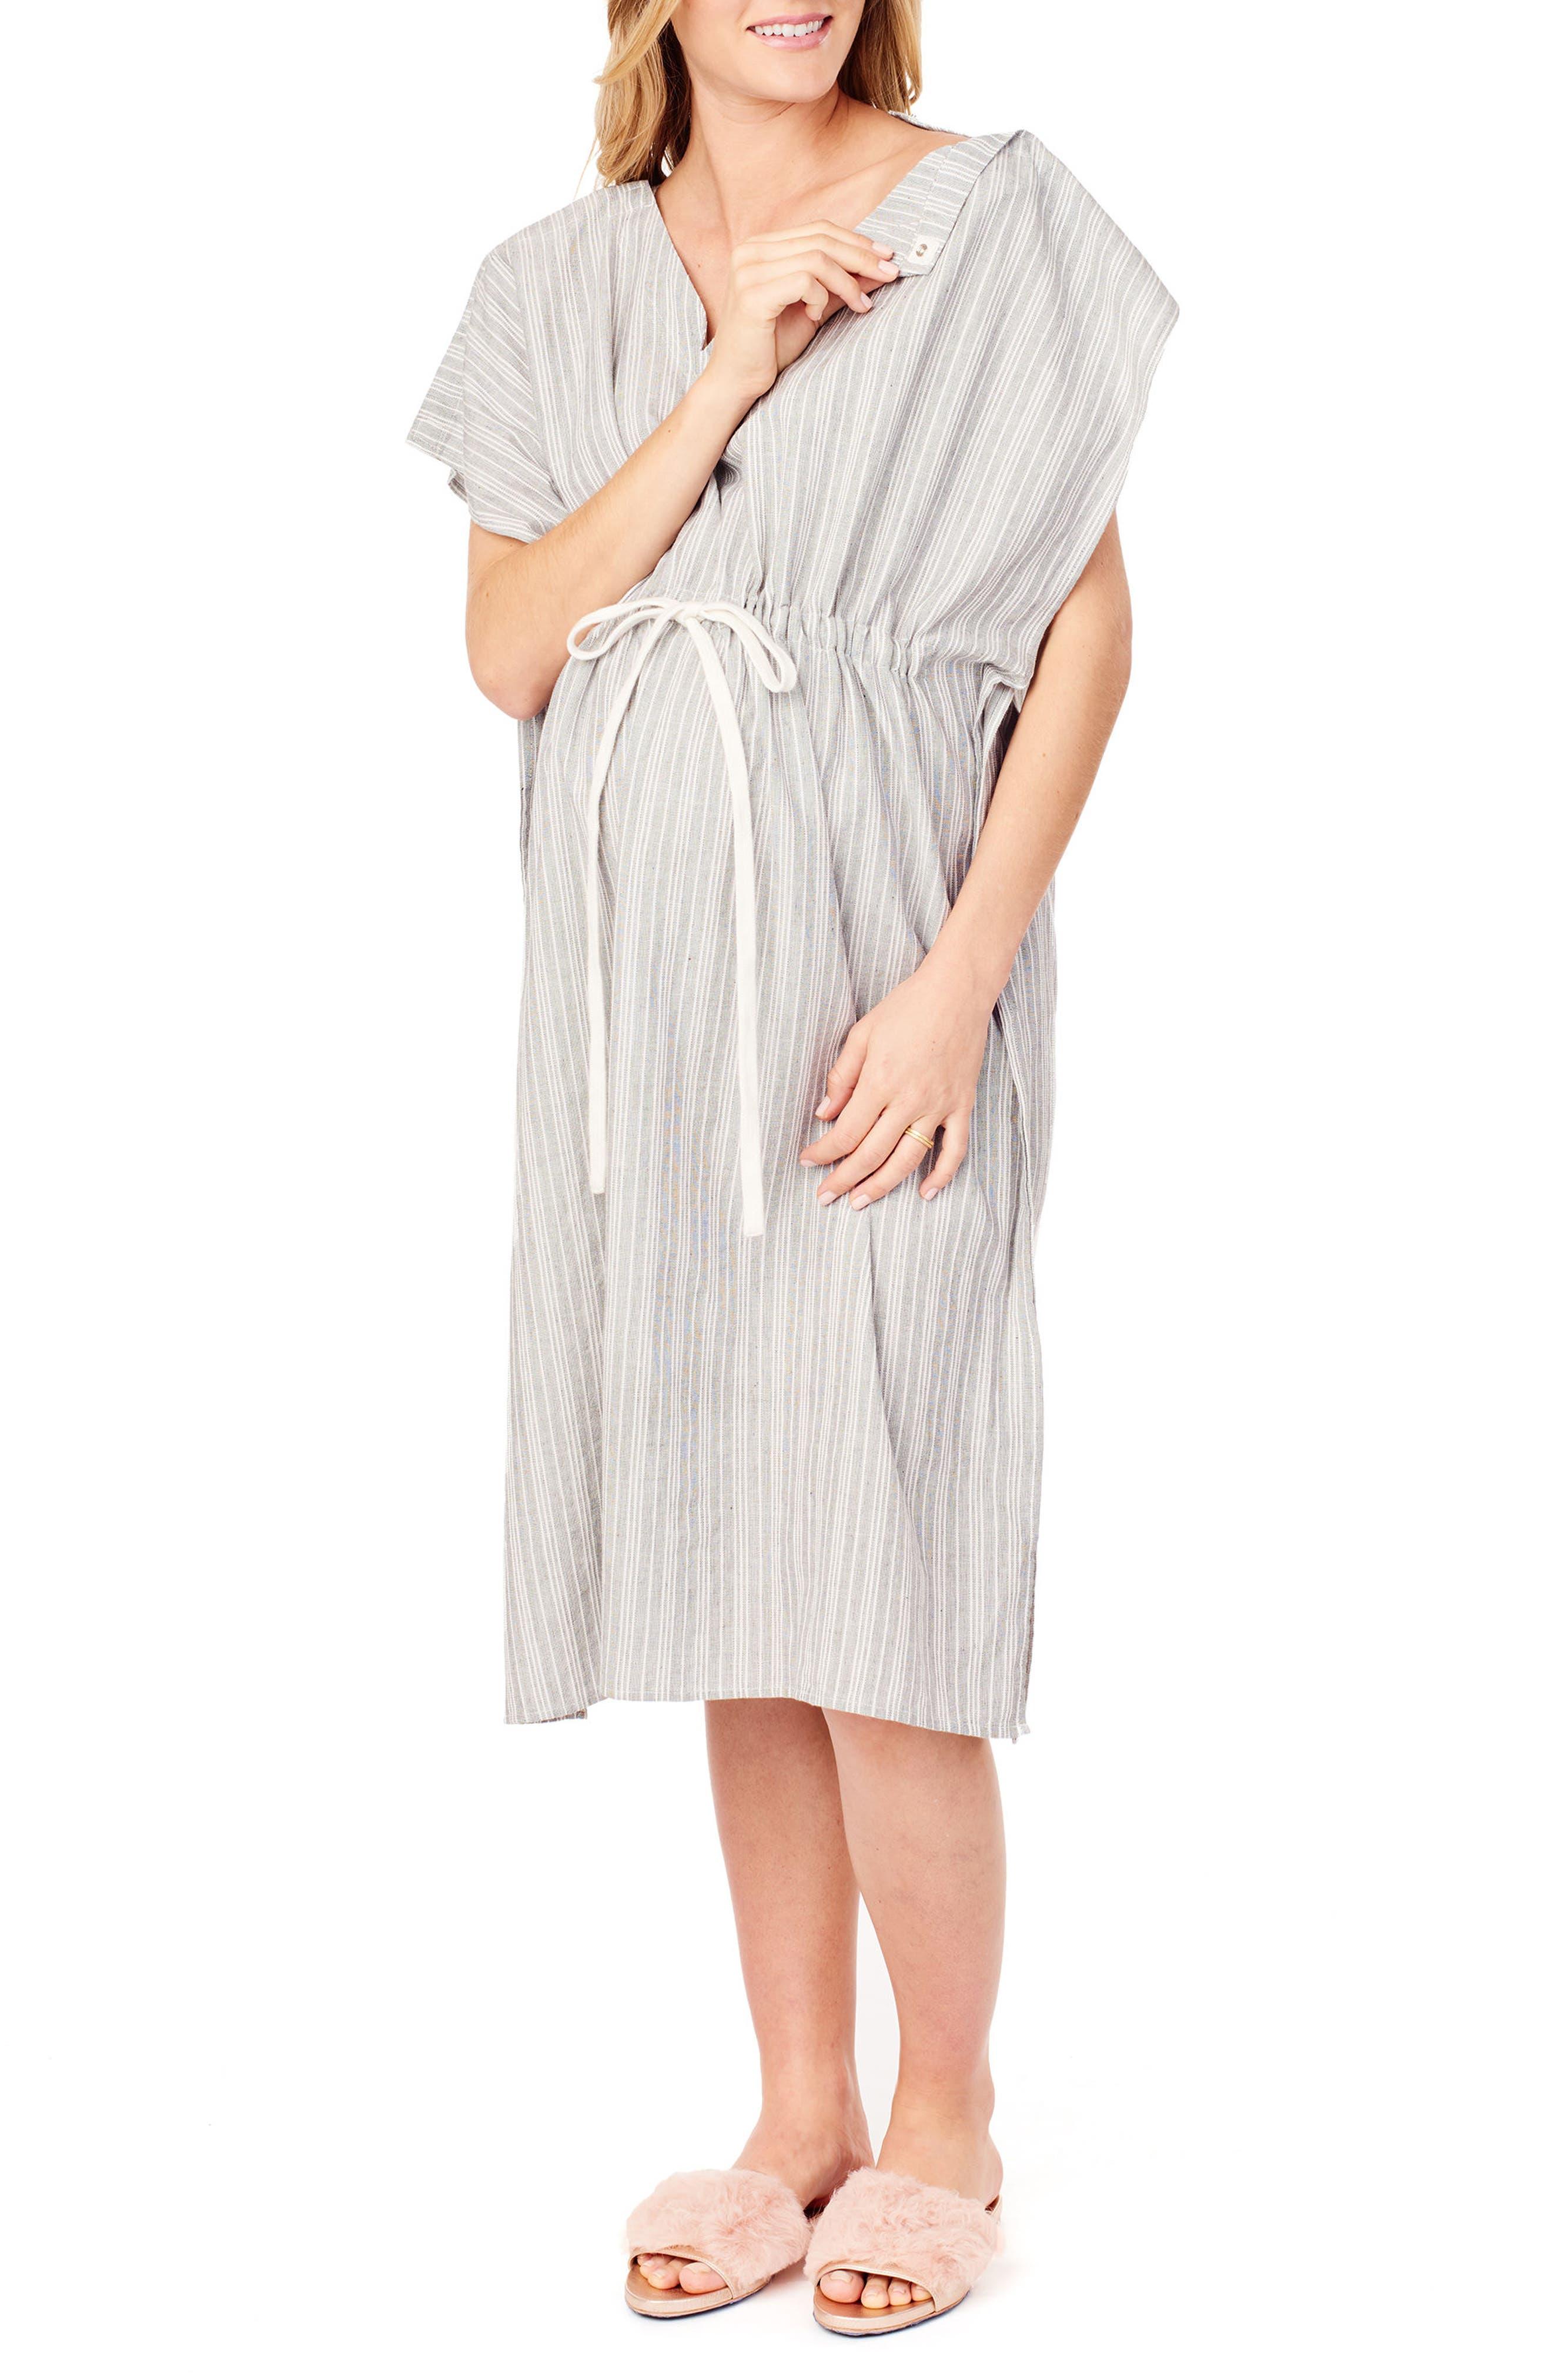 x James Fox & Co. Maternity/Nursing Hospital Gown,                             Alternate thumbnail 3, color,                             BLACK/ WHITE DOBBY STRIPE